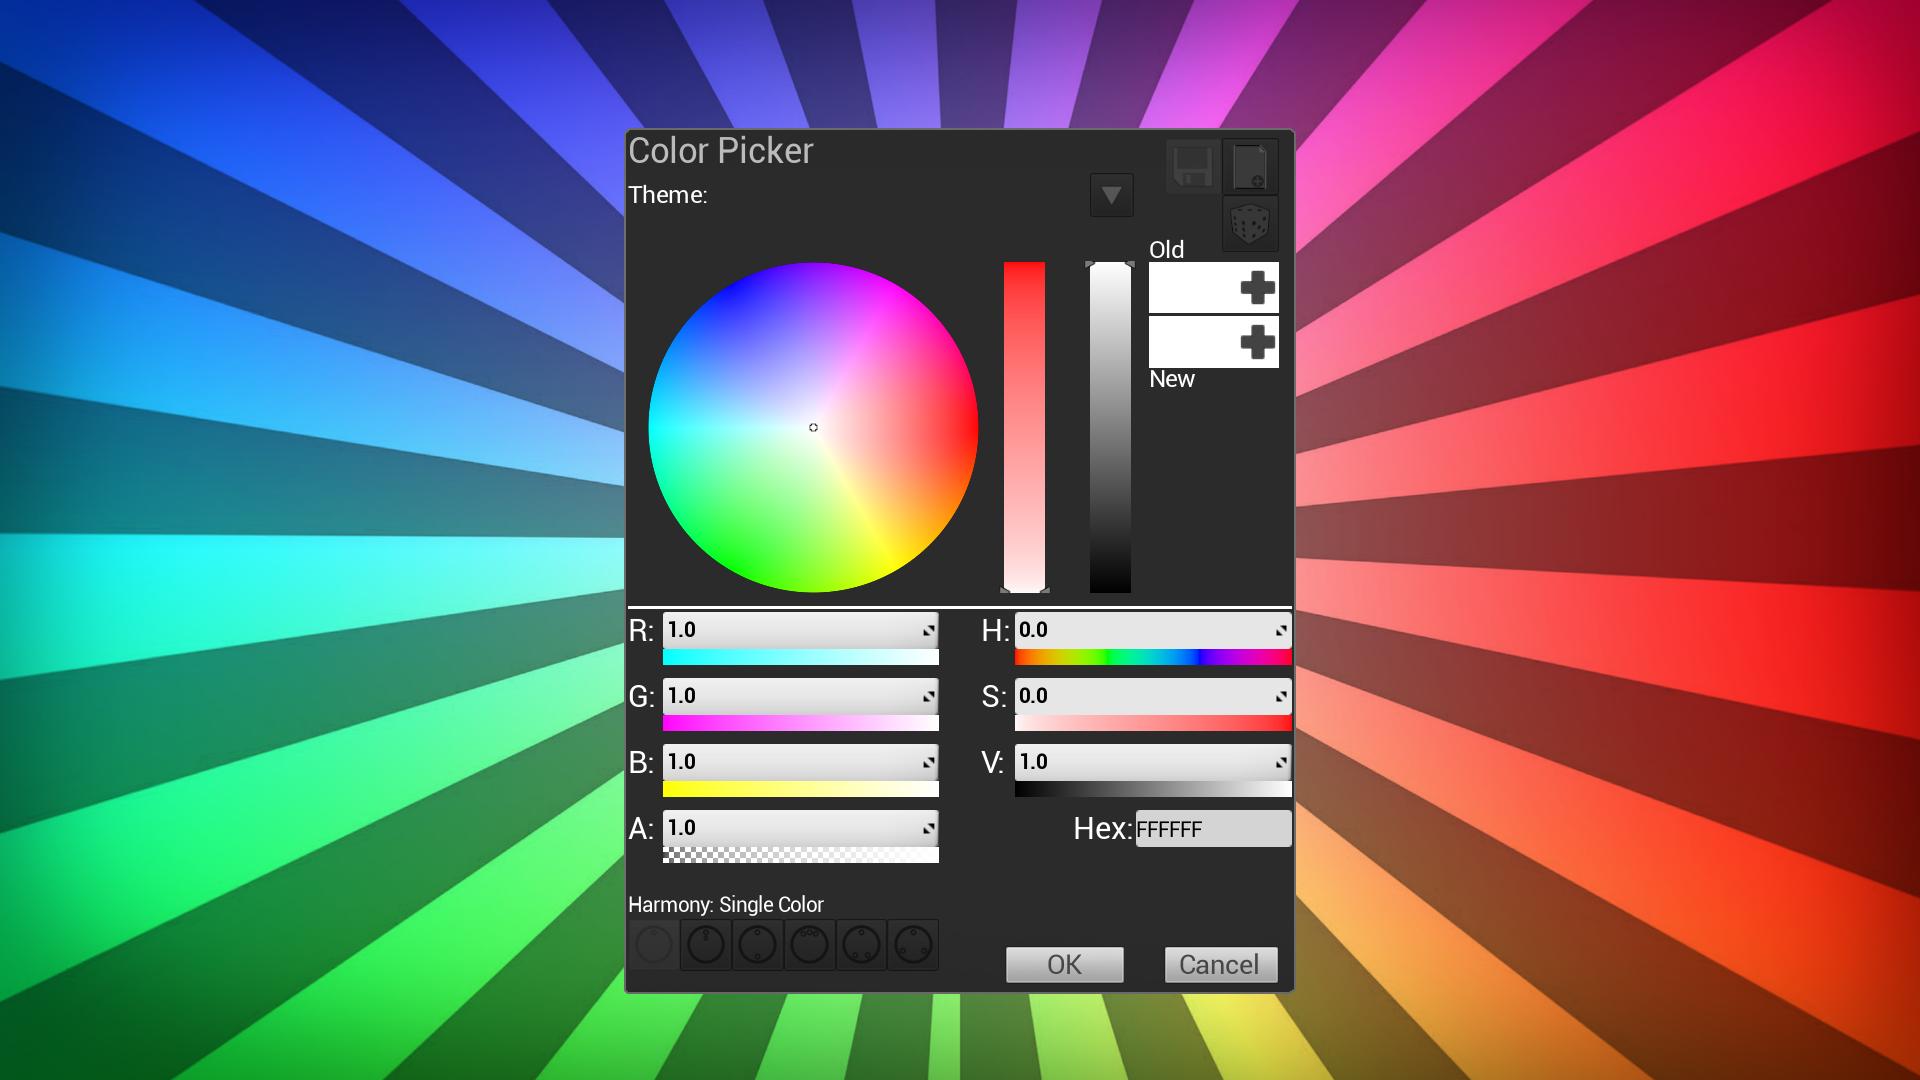 UMG Color Picker (Christopher Sydell)